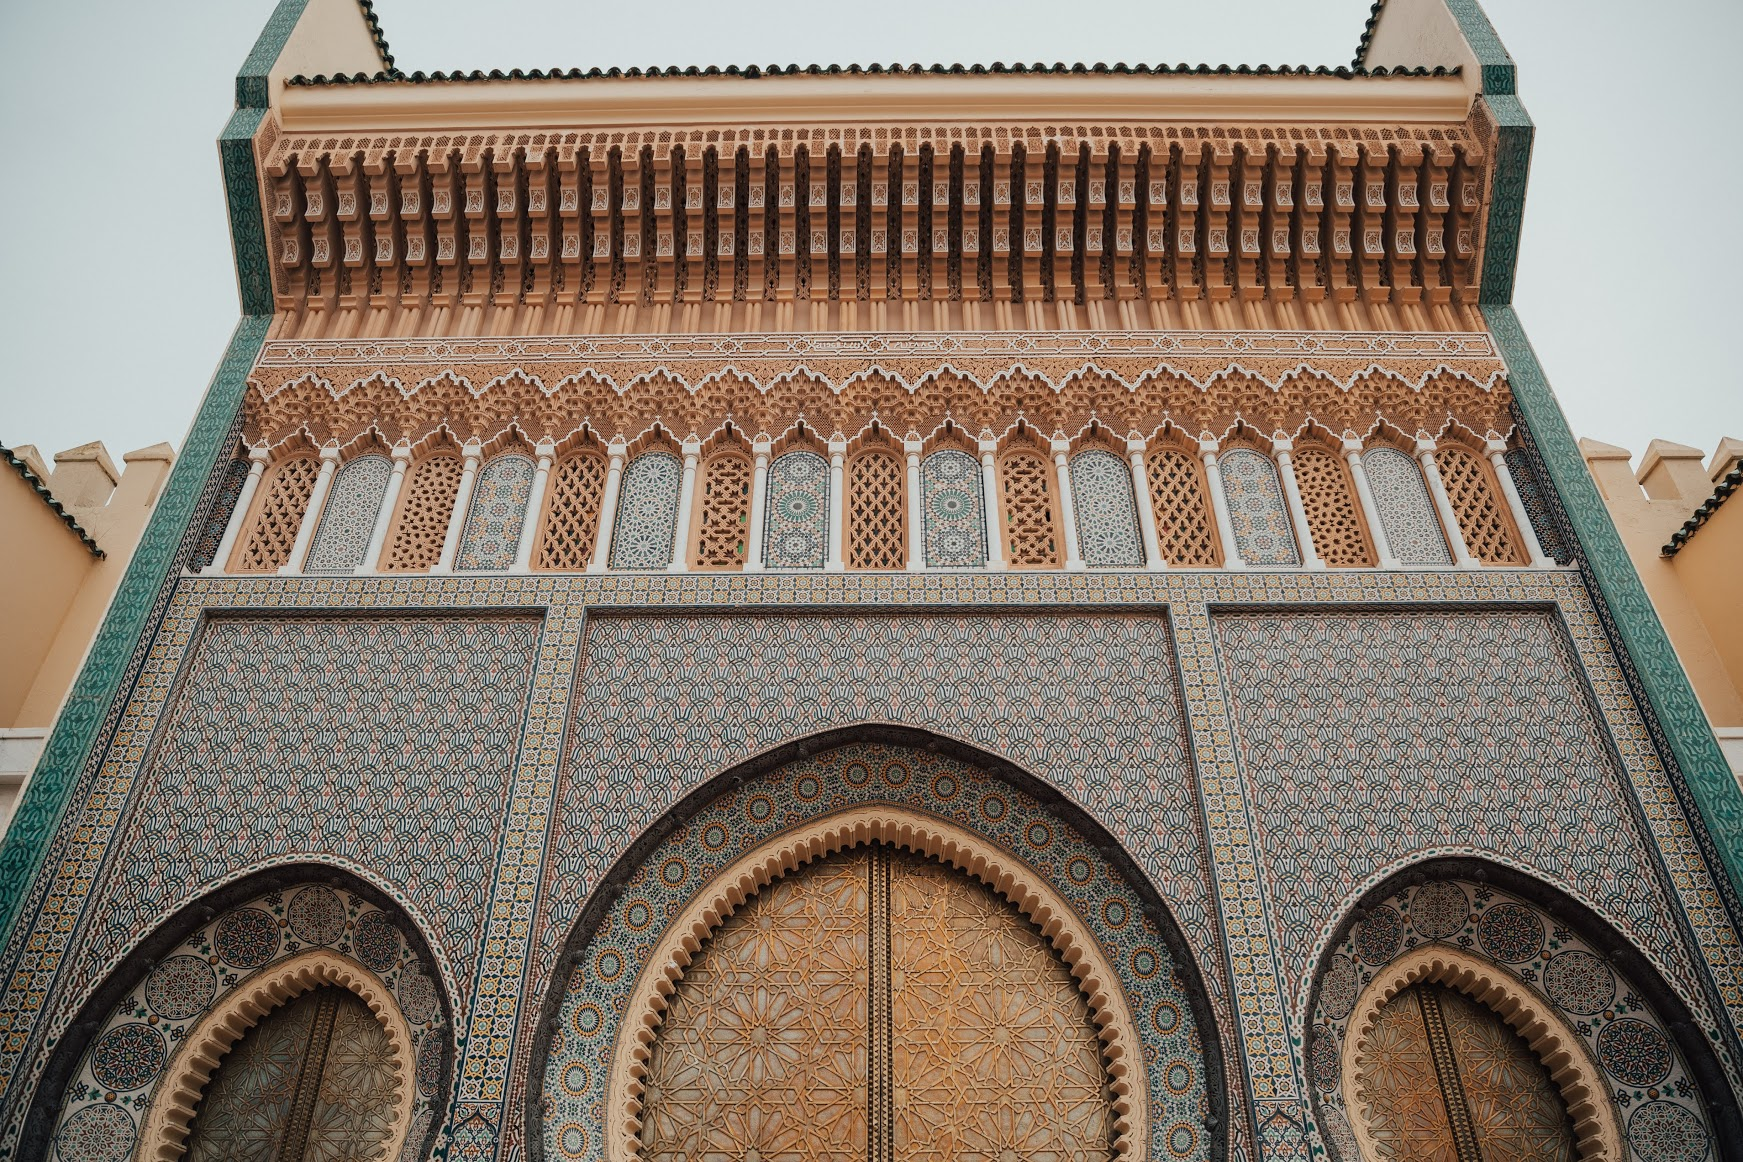 Morocco Fes Market-1.jpg